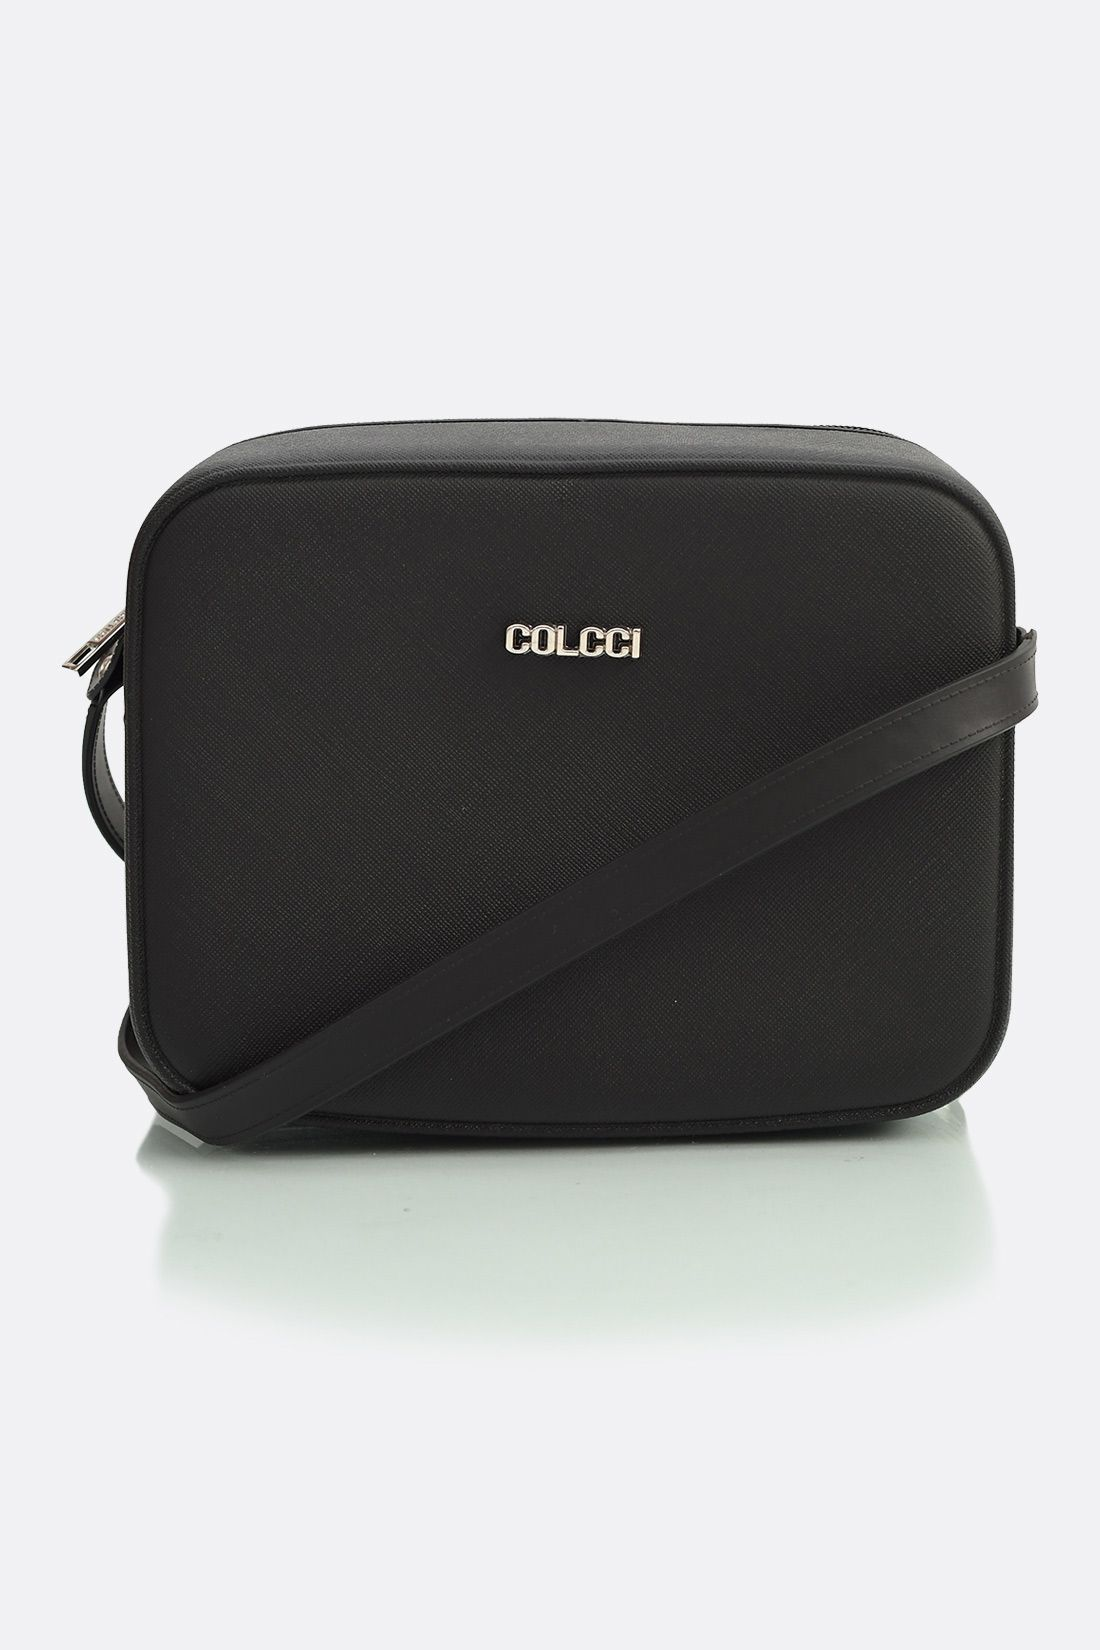 Bolsa Colcci Xangai